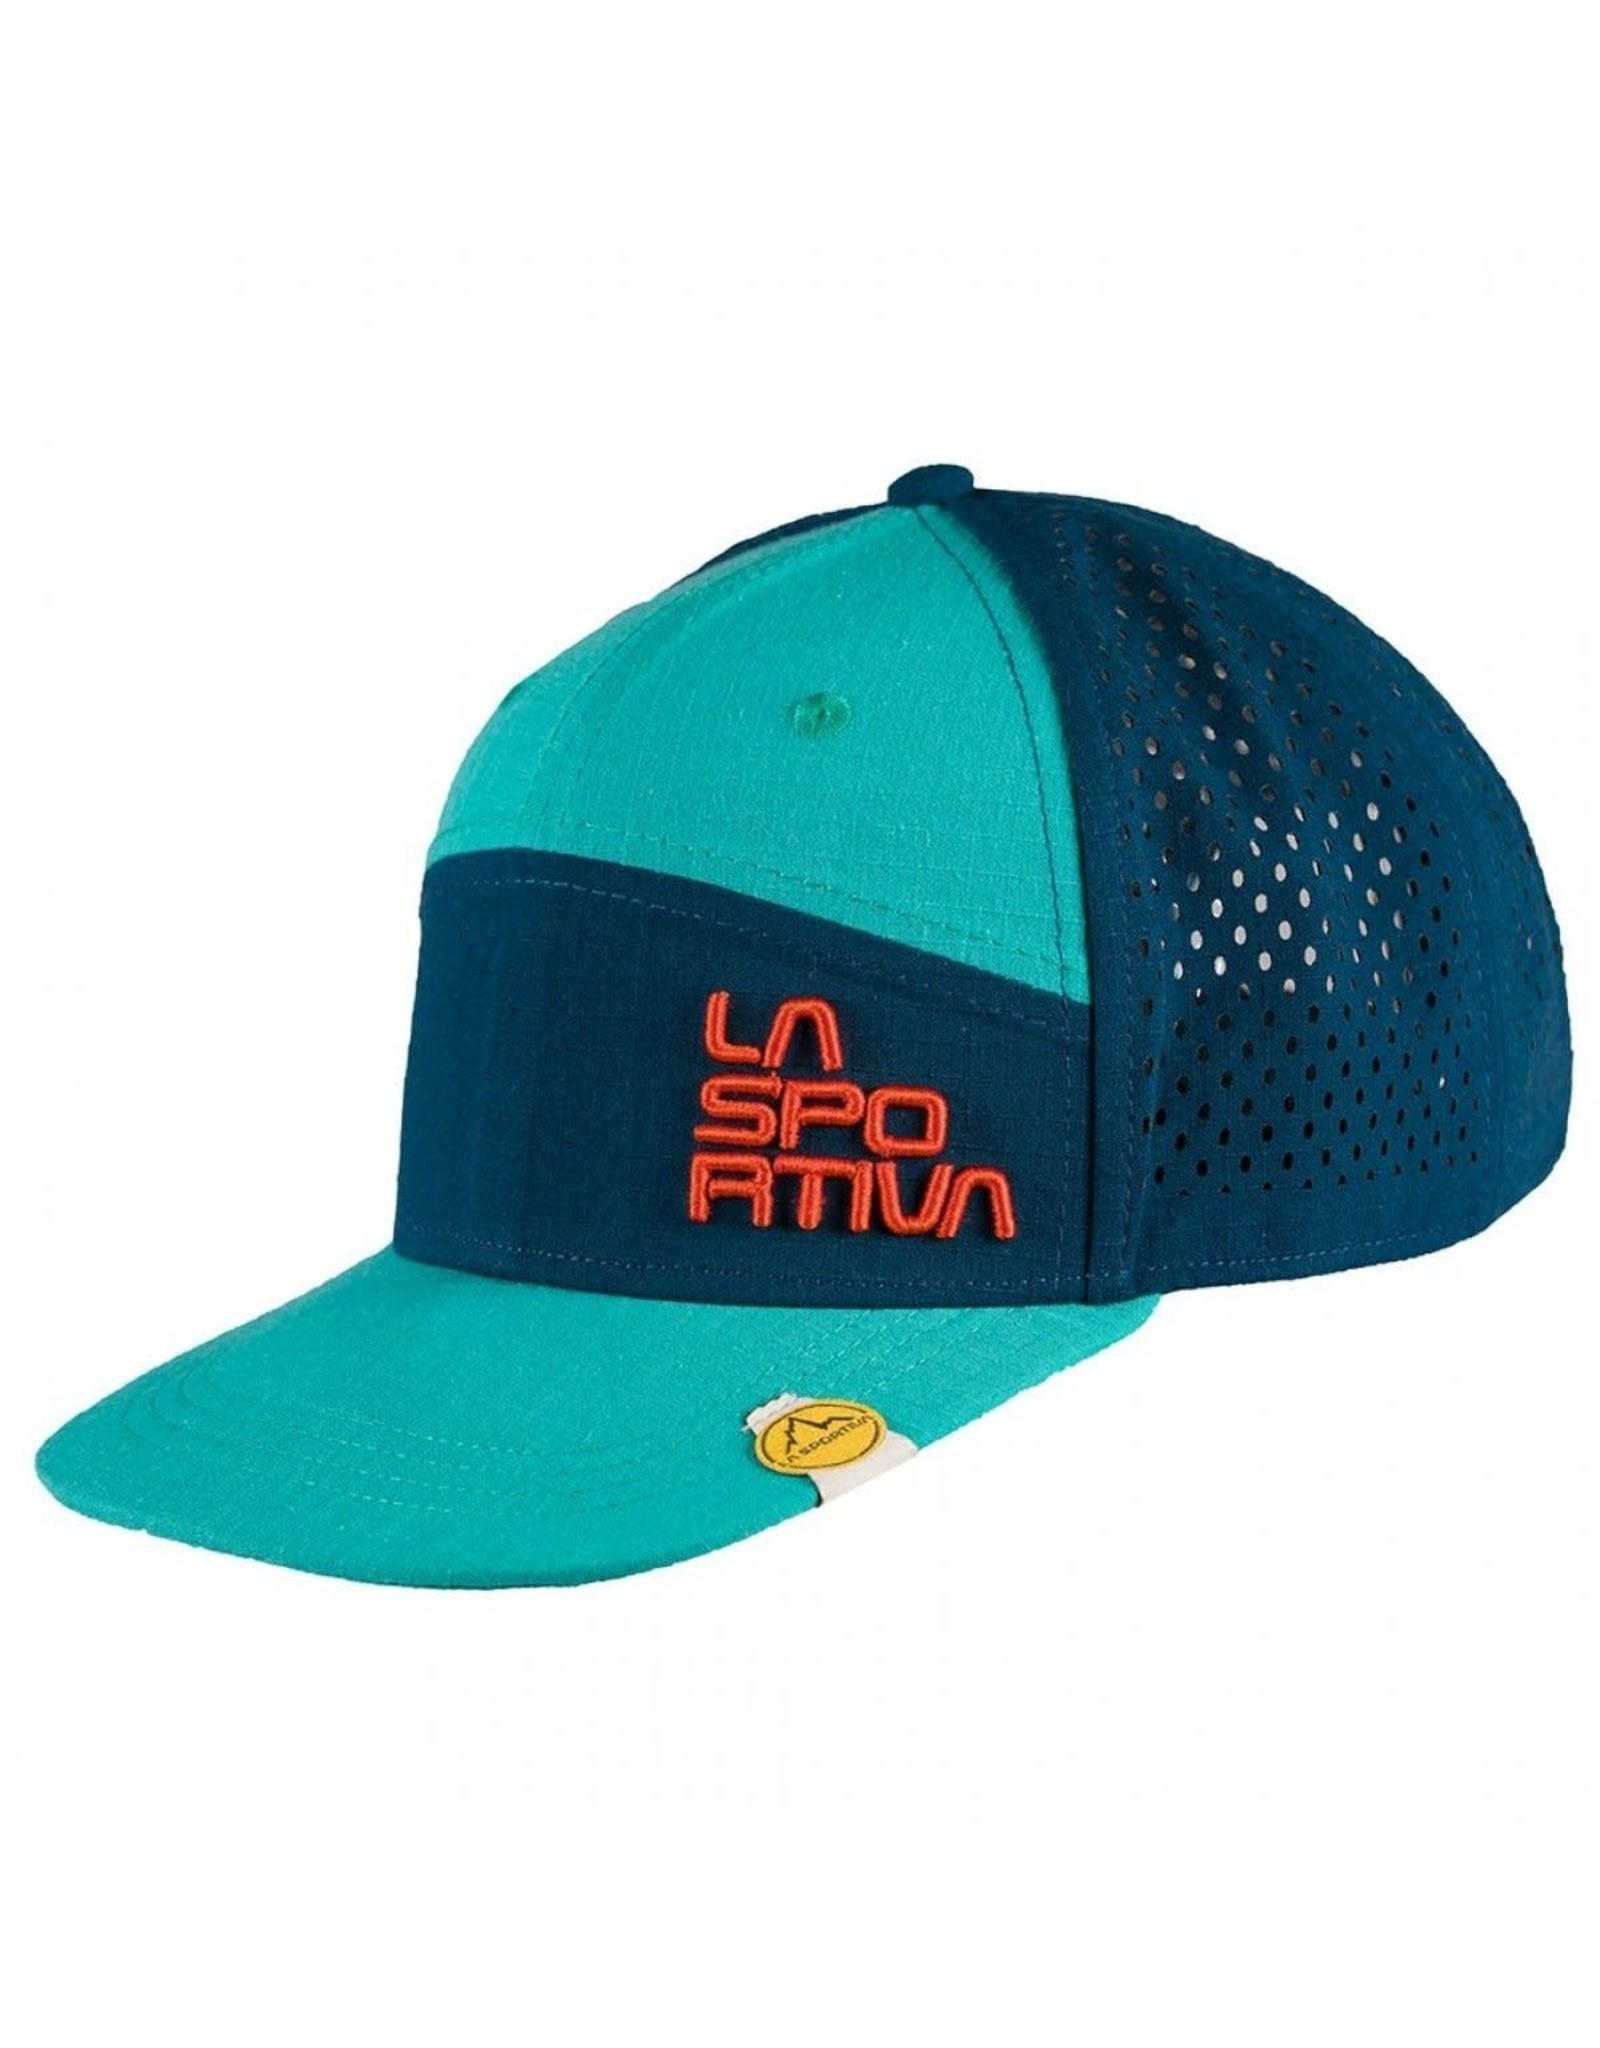 La Sportiva La Sportiva Traverse Trucker Hat